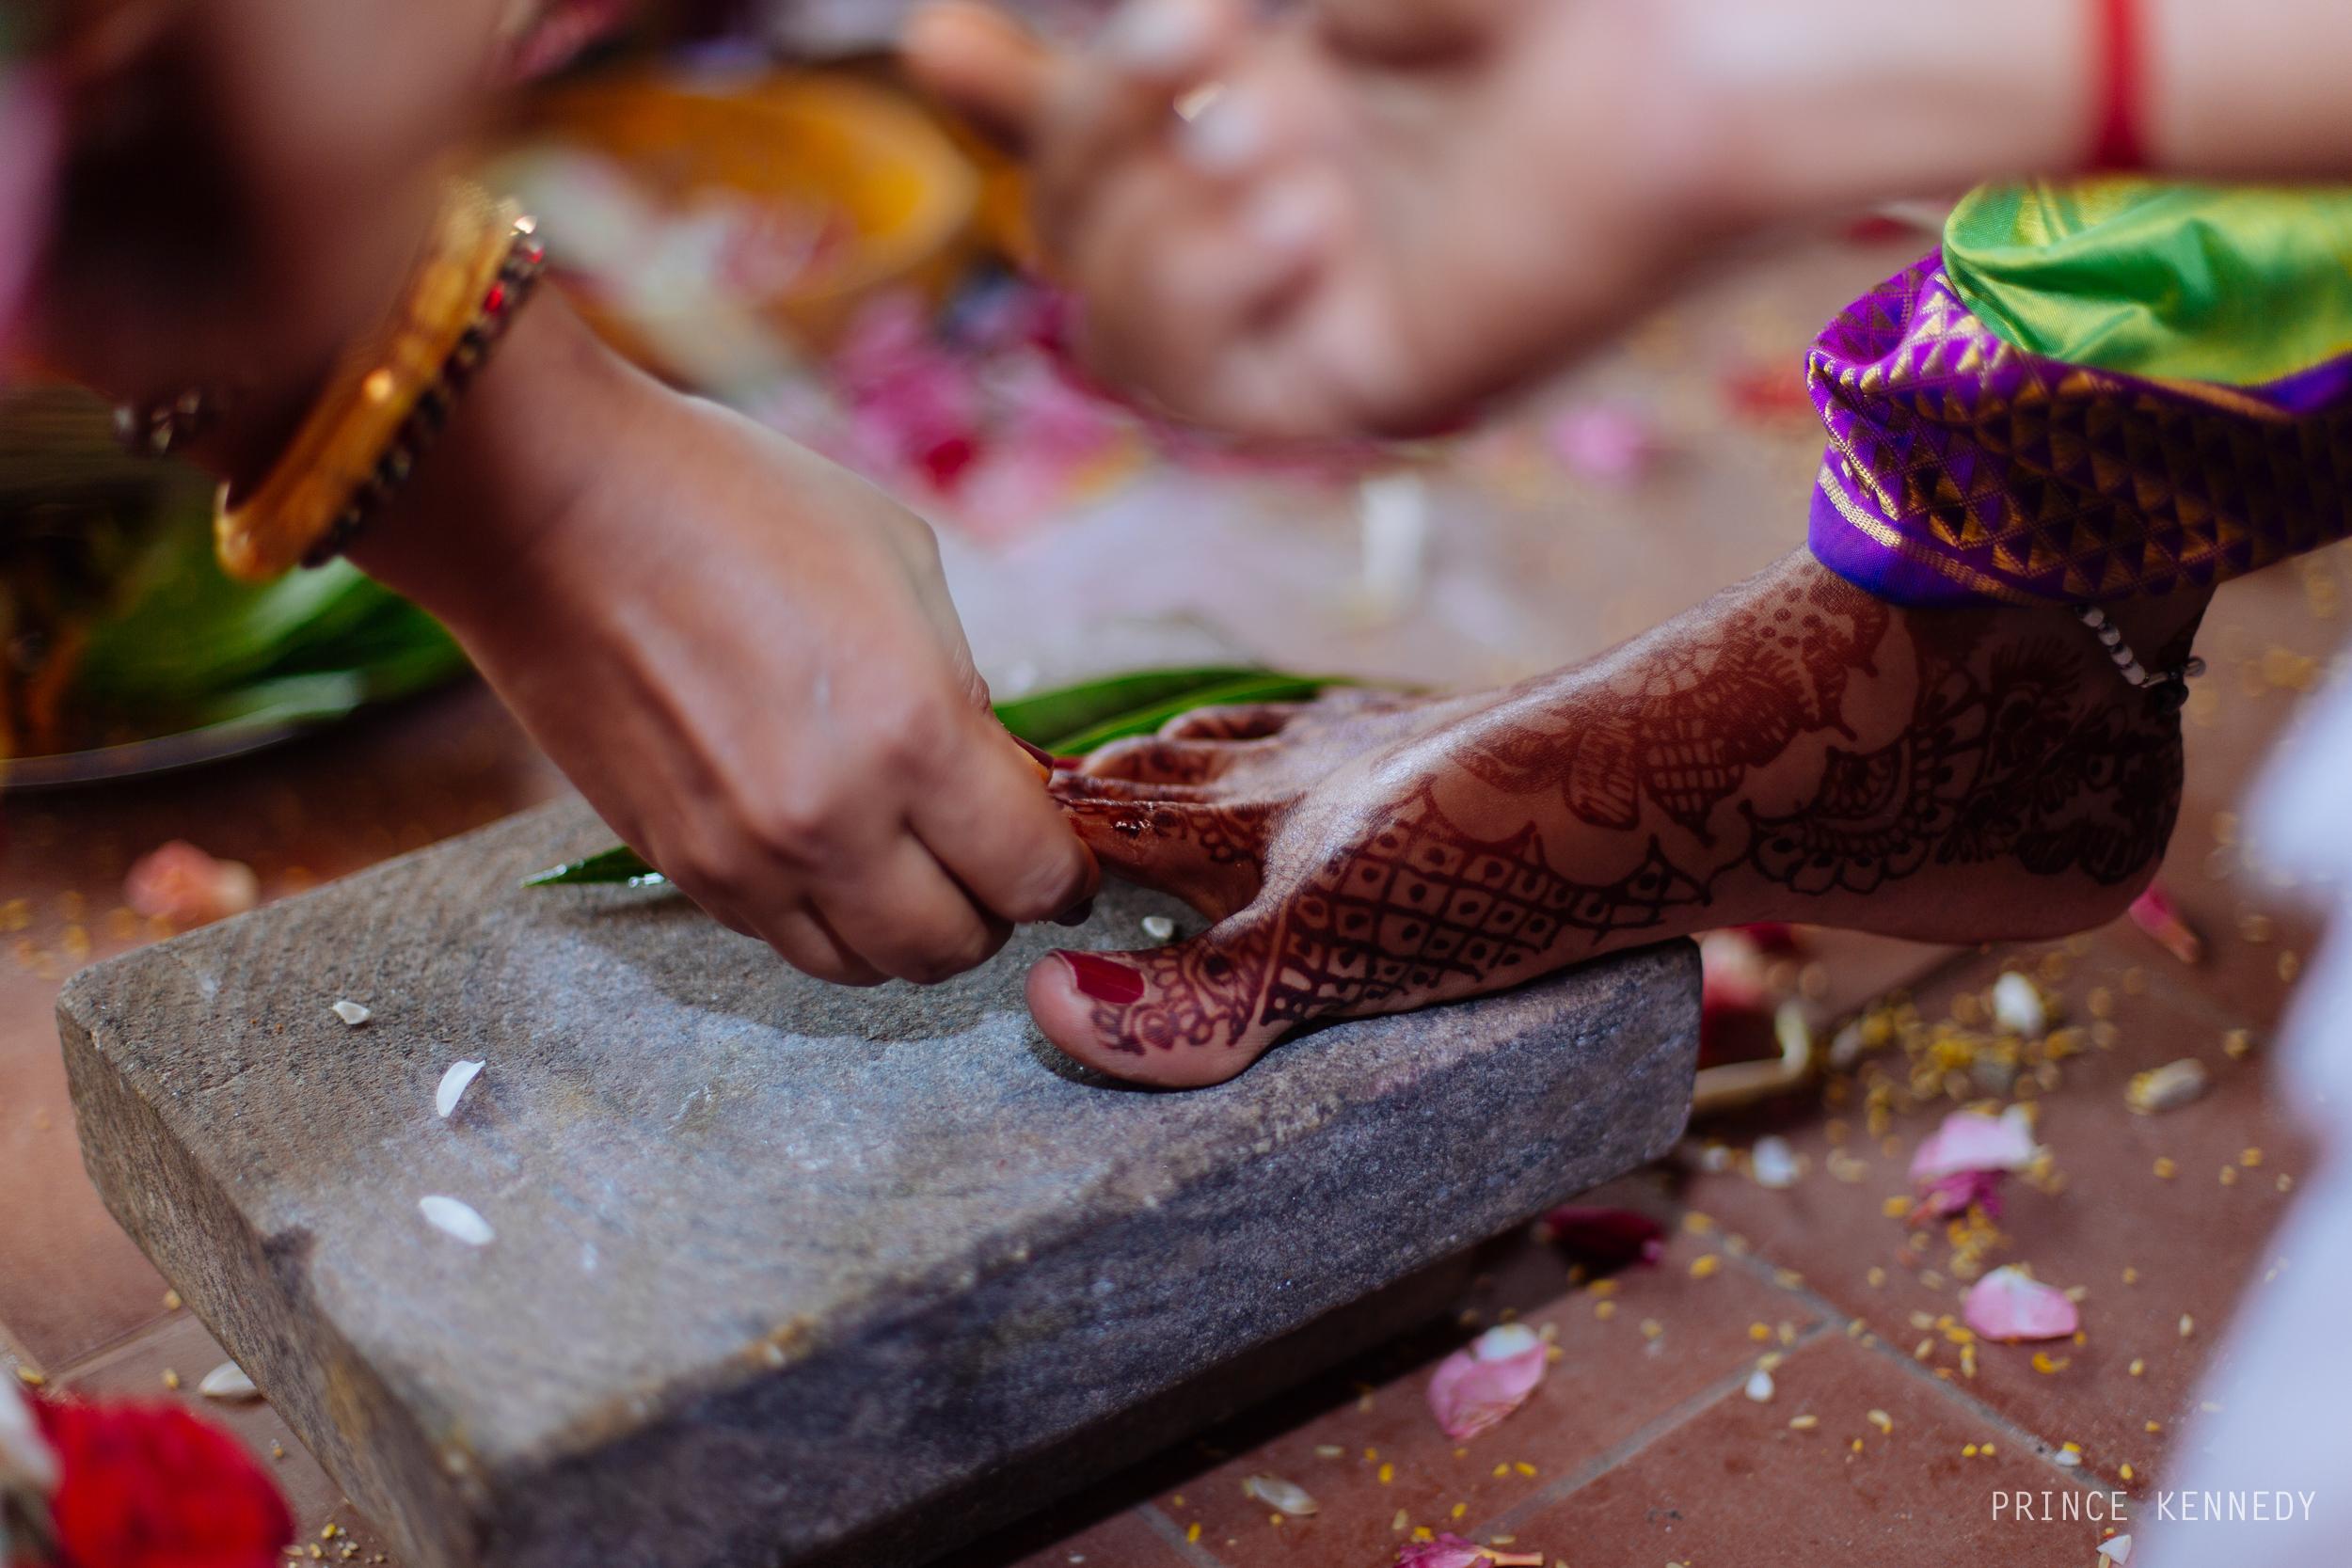 Athmajja-Nithesh-Engagement-Couple-Portrait-Portraiture-Wedding-Couple-Portrait-Chennai-Photographer-Candid-Photography-Destination-Best-Prince-Kennedy-Photography-315.jpg